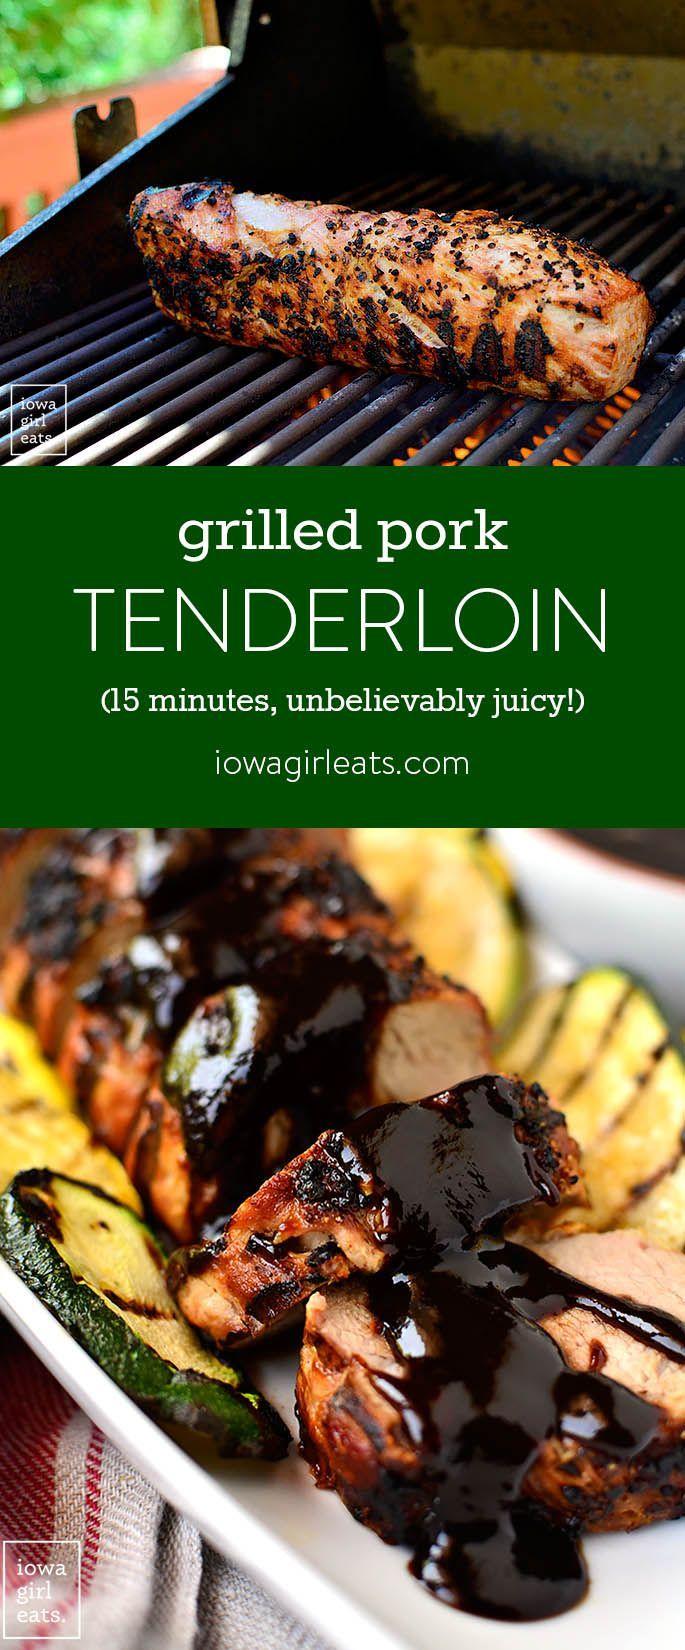 (Unbelievably Juicy!) Grilled Pork Tenderloin - Easy Grilling Recipe